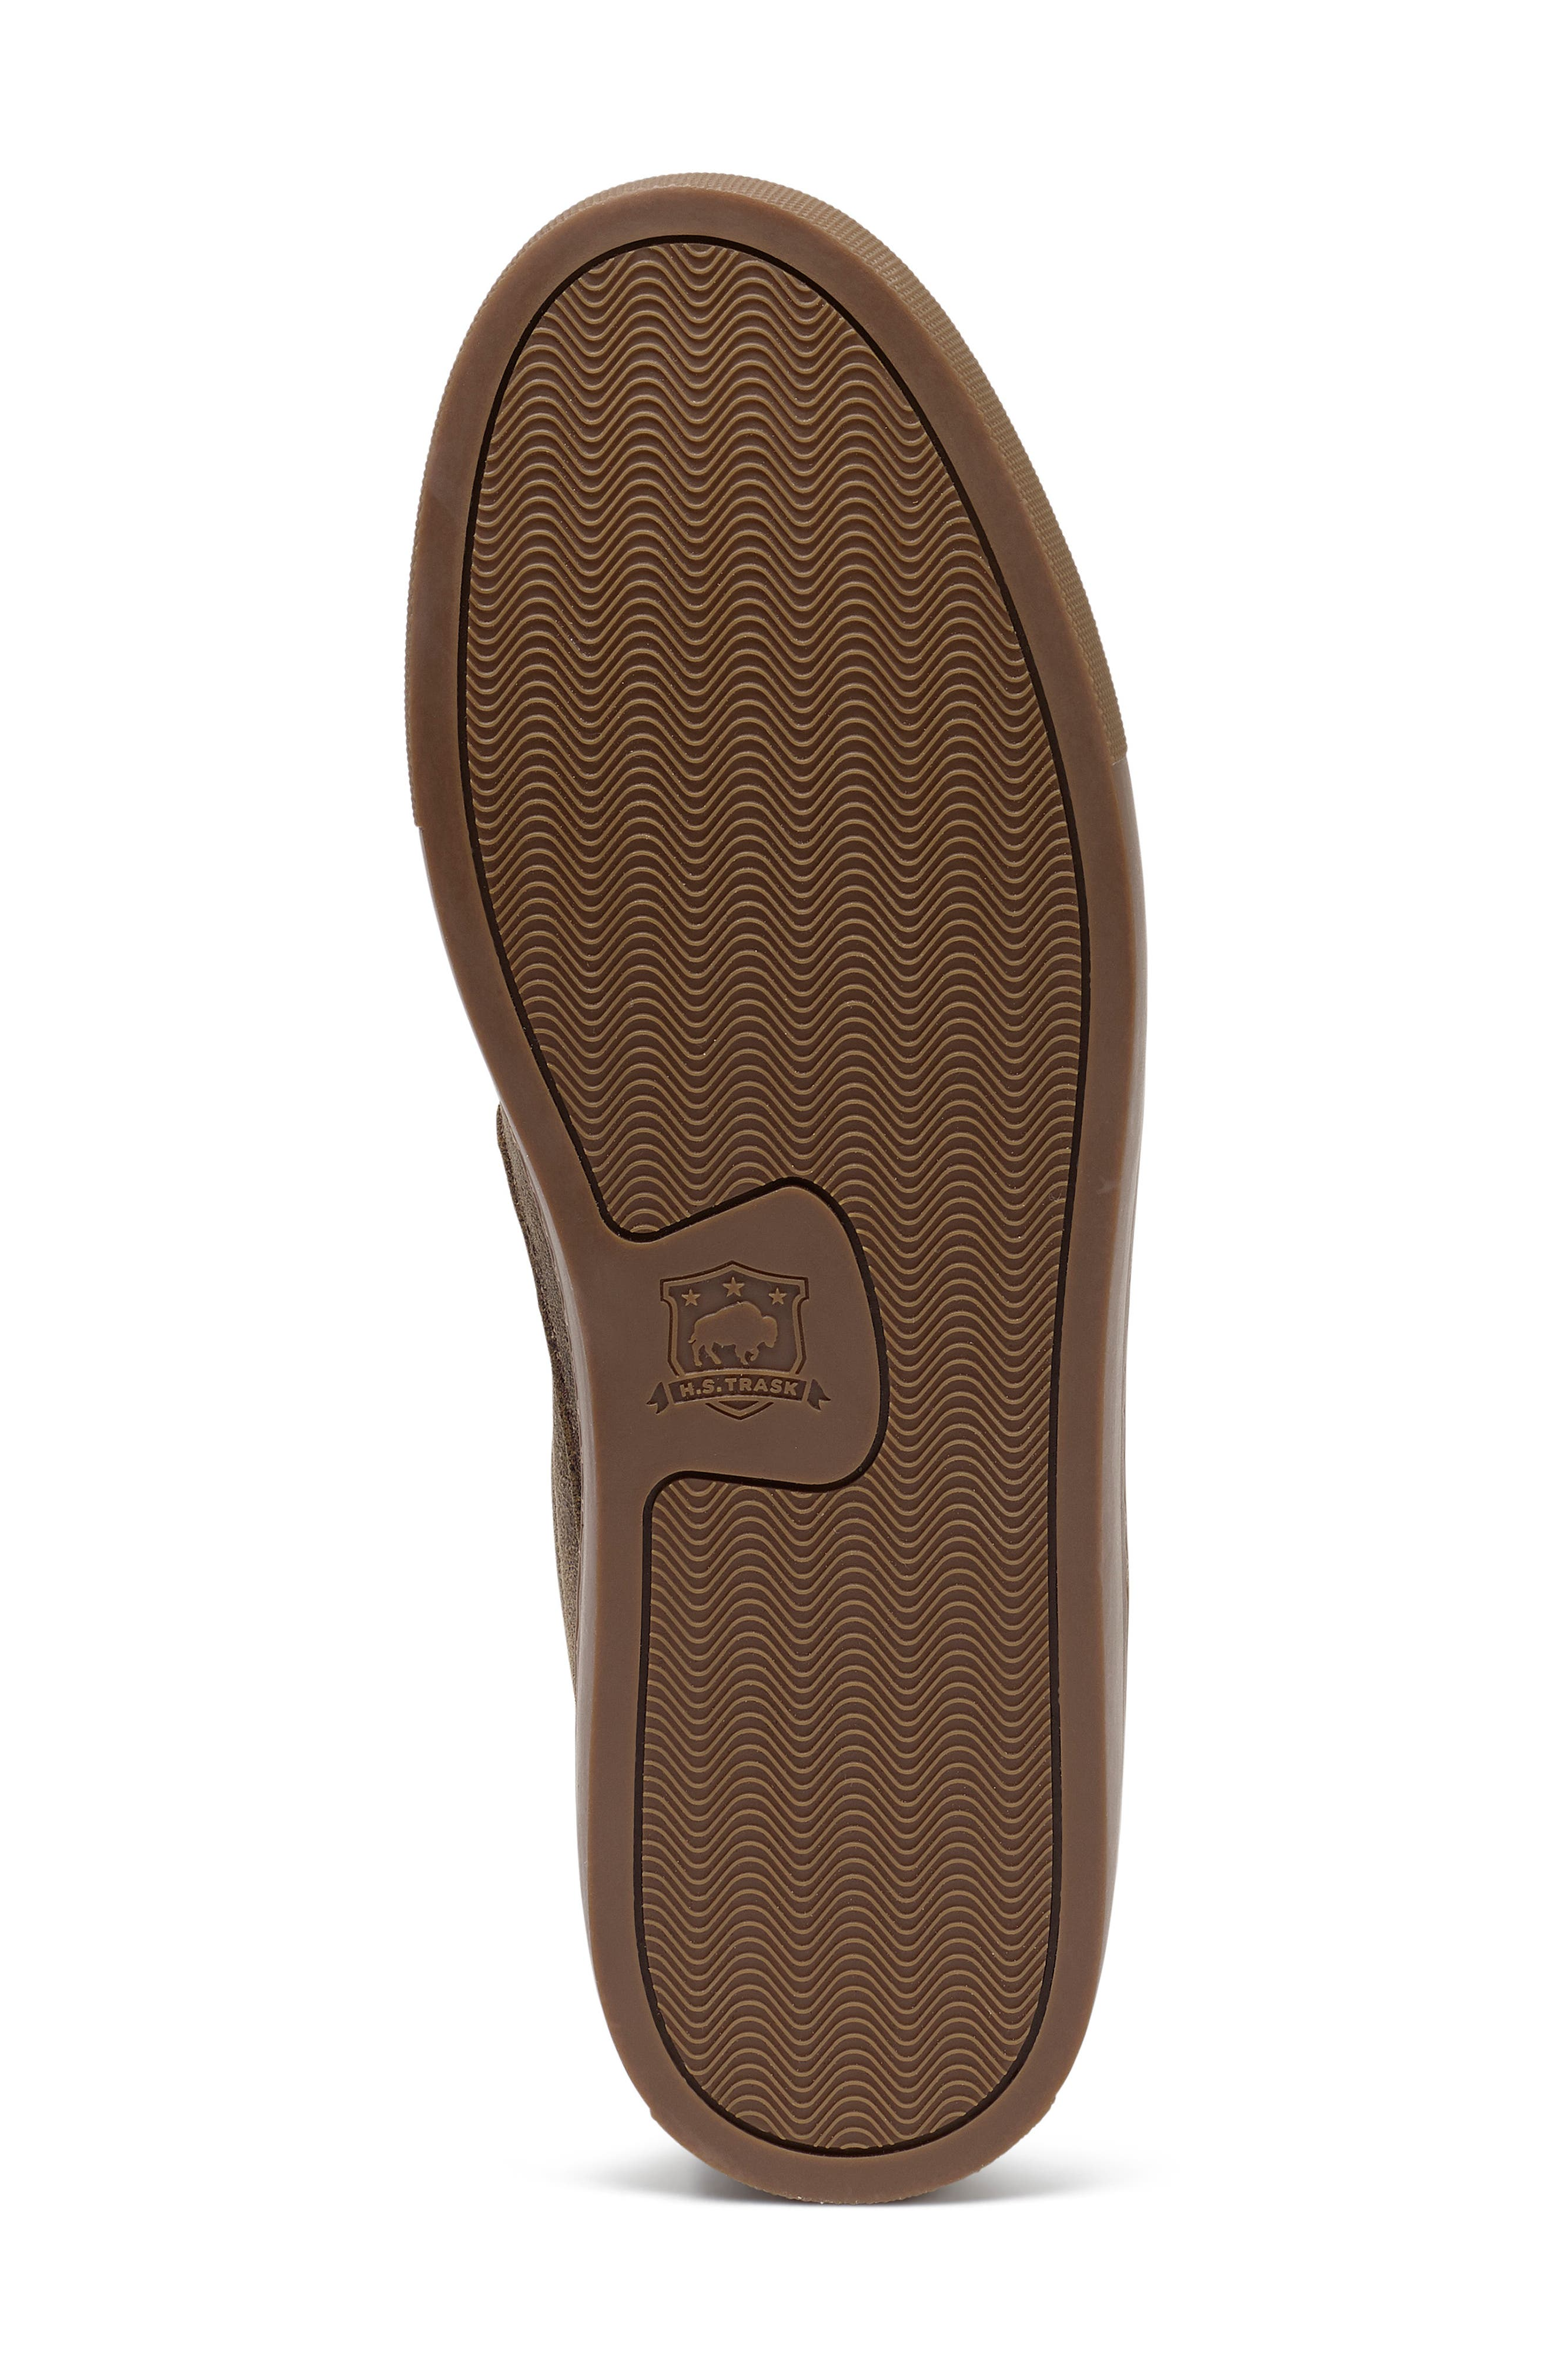 Alex Genuine Shearling Slip-On Sneaker,                             Alternate thumbnail 6, color,                             BROWN SUEDE